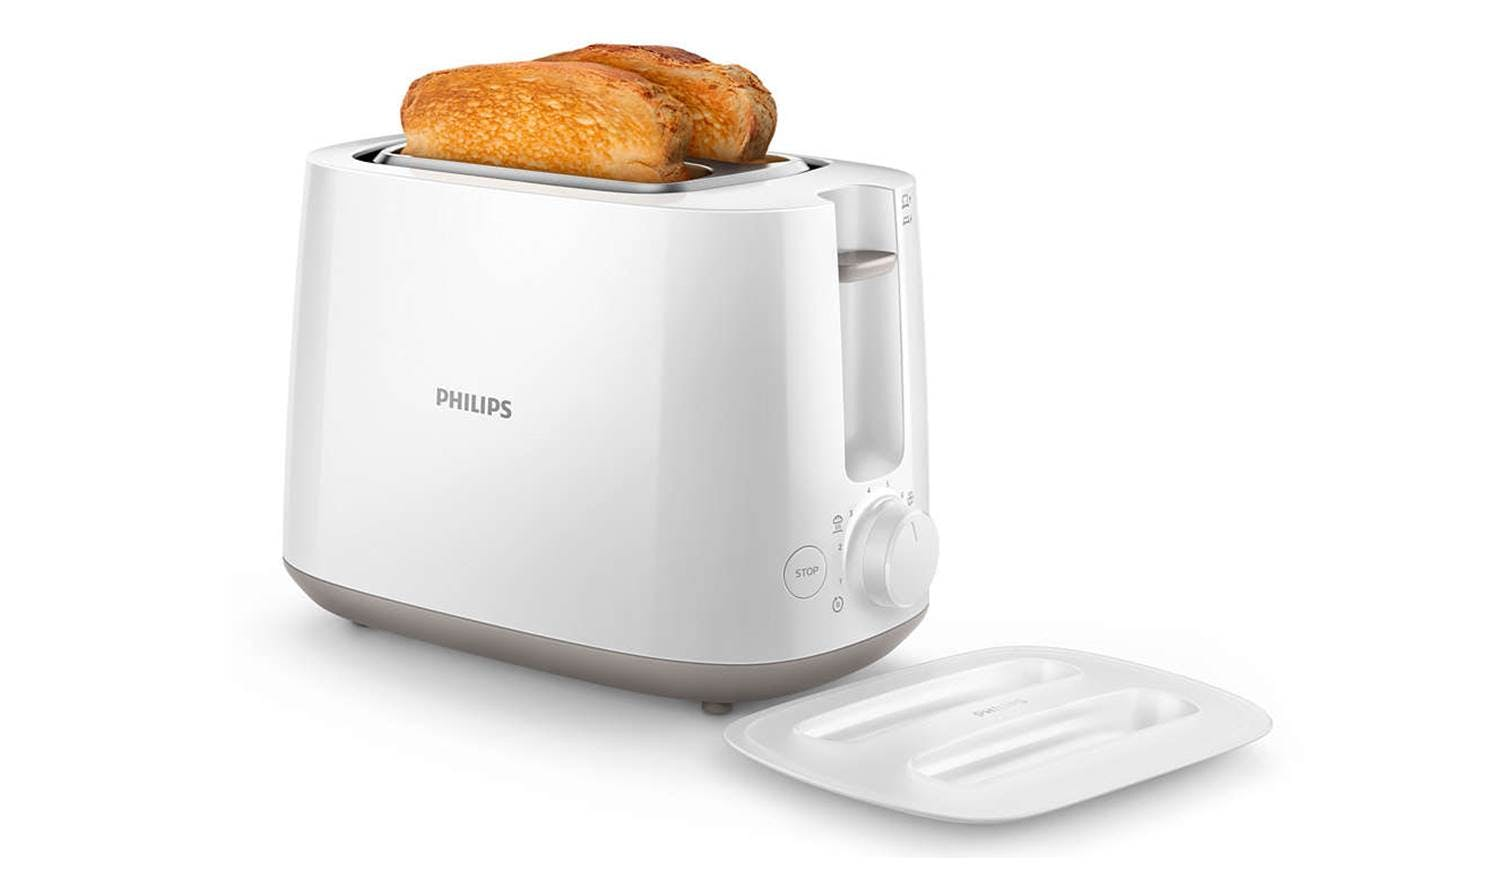 Philips Small Kitchen Appliances